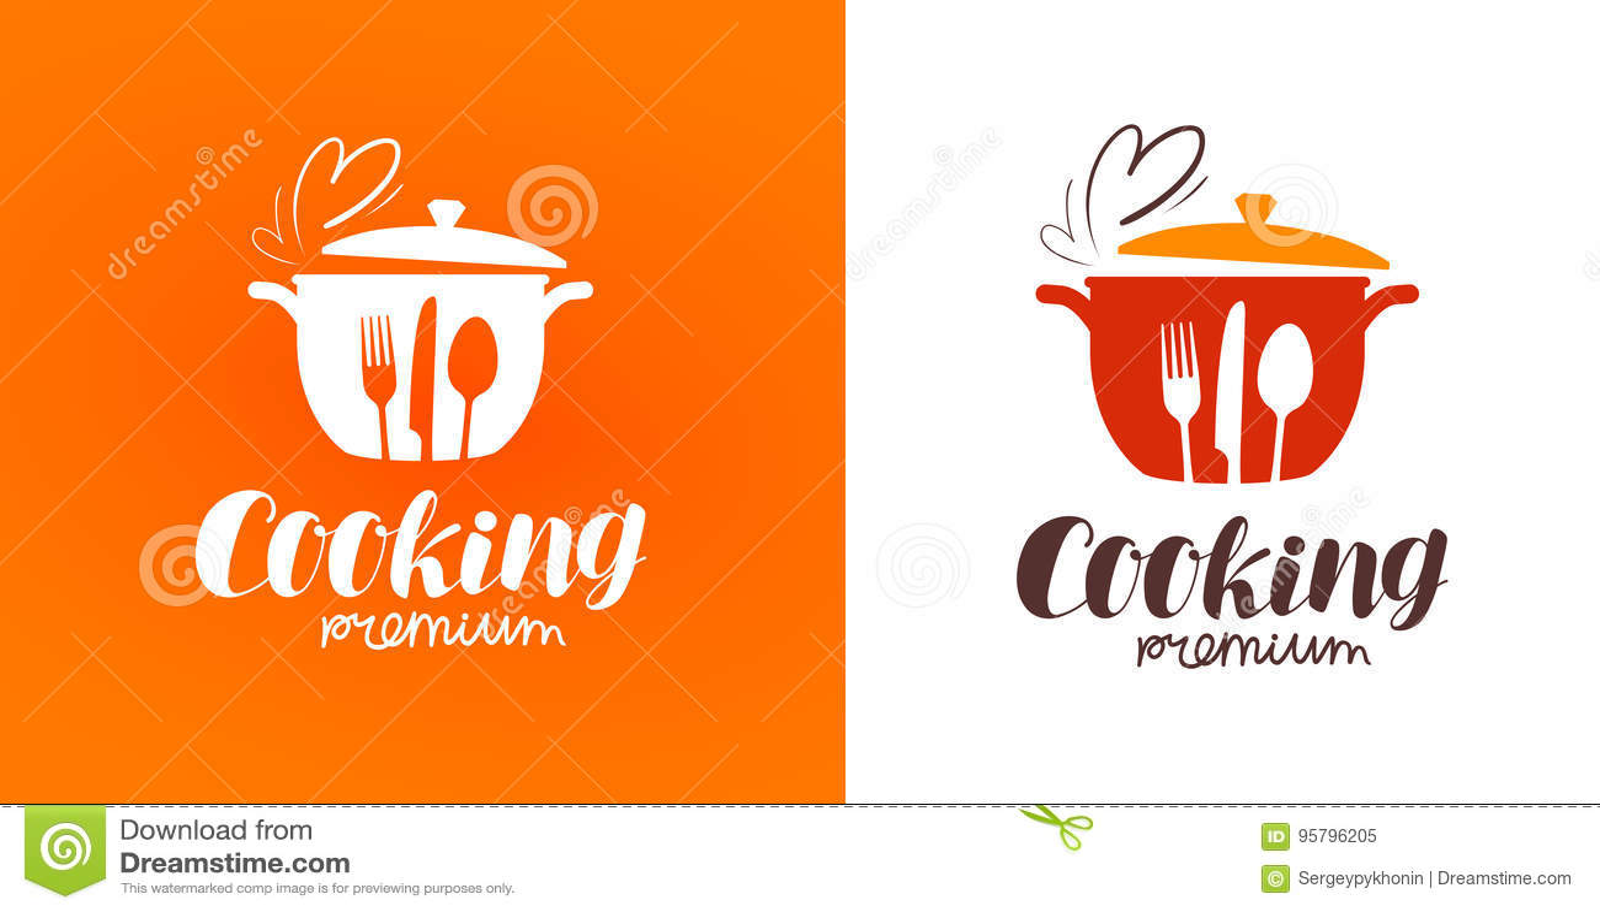 Cooking, cuisine, cookery logo. Restaurant, menu, cafe, diner label or icon. Vector illustration